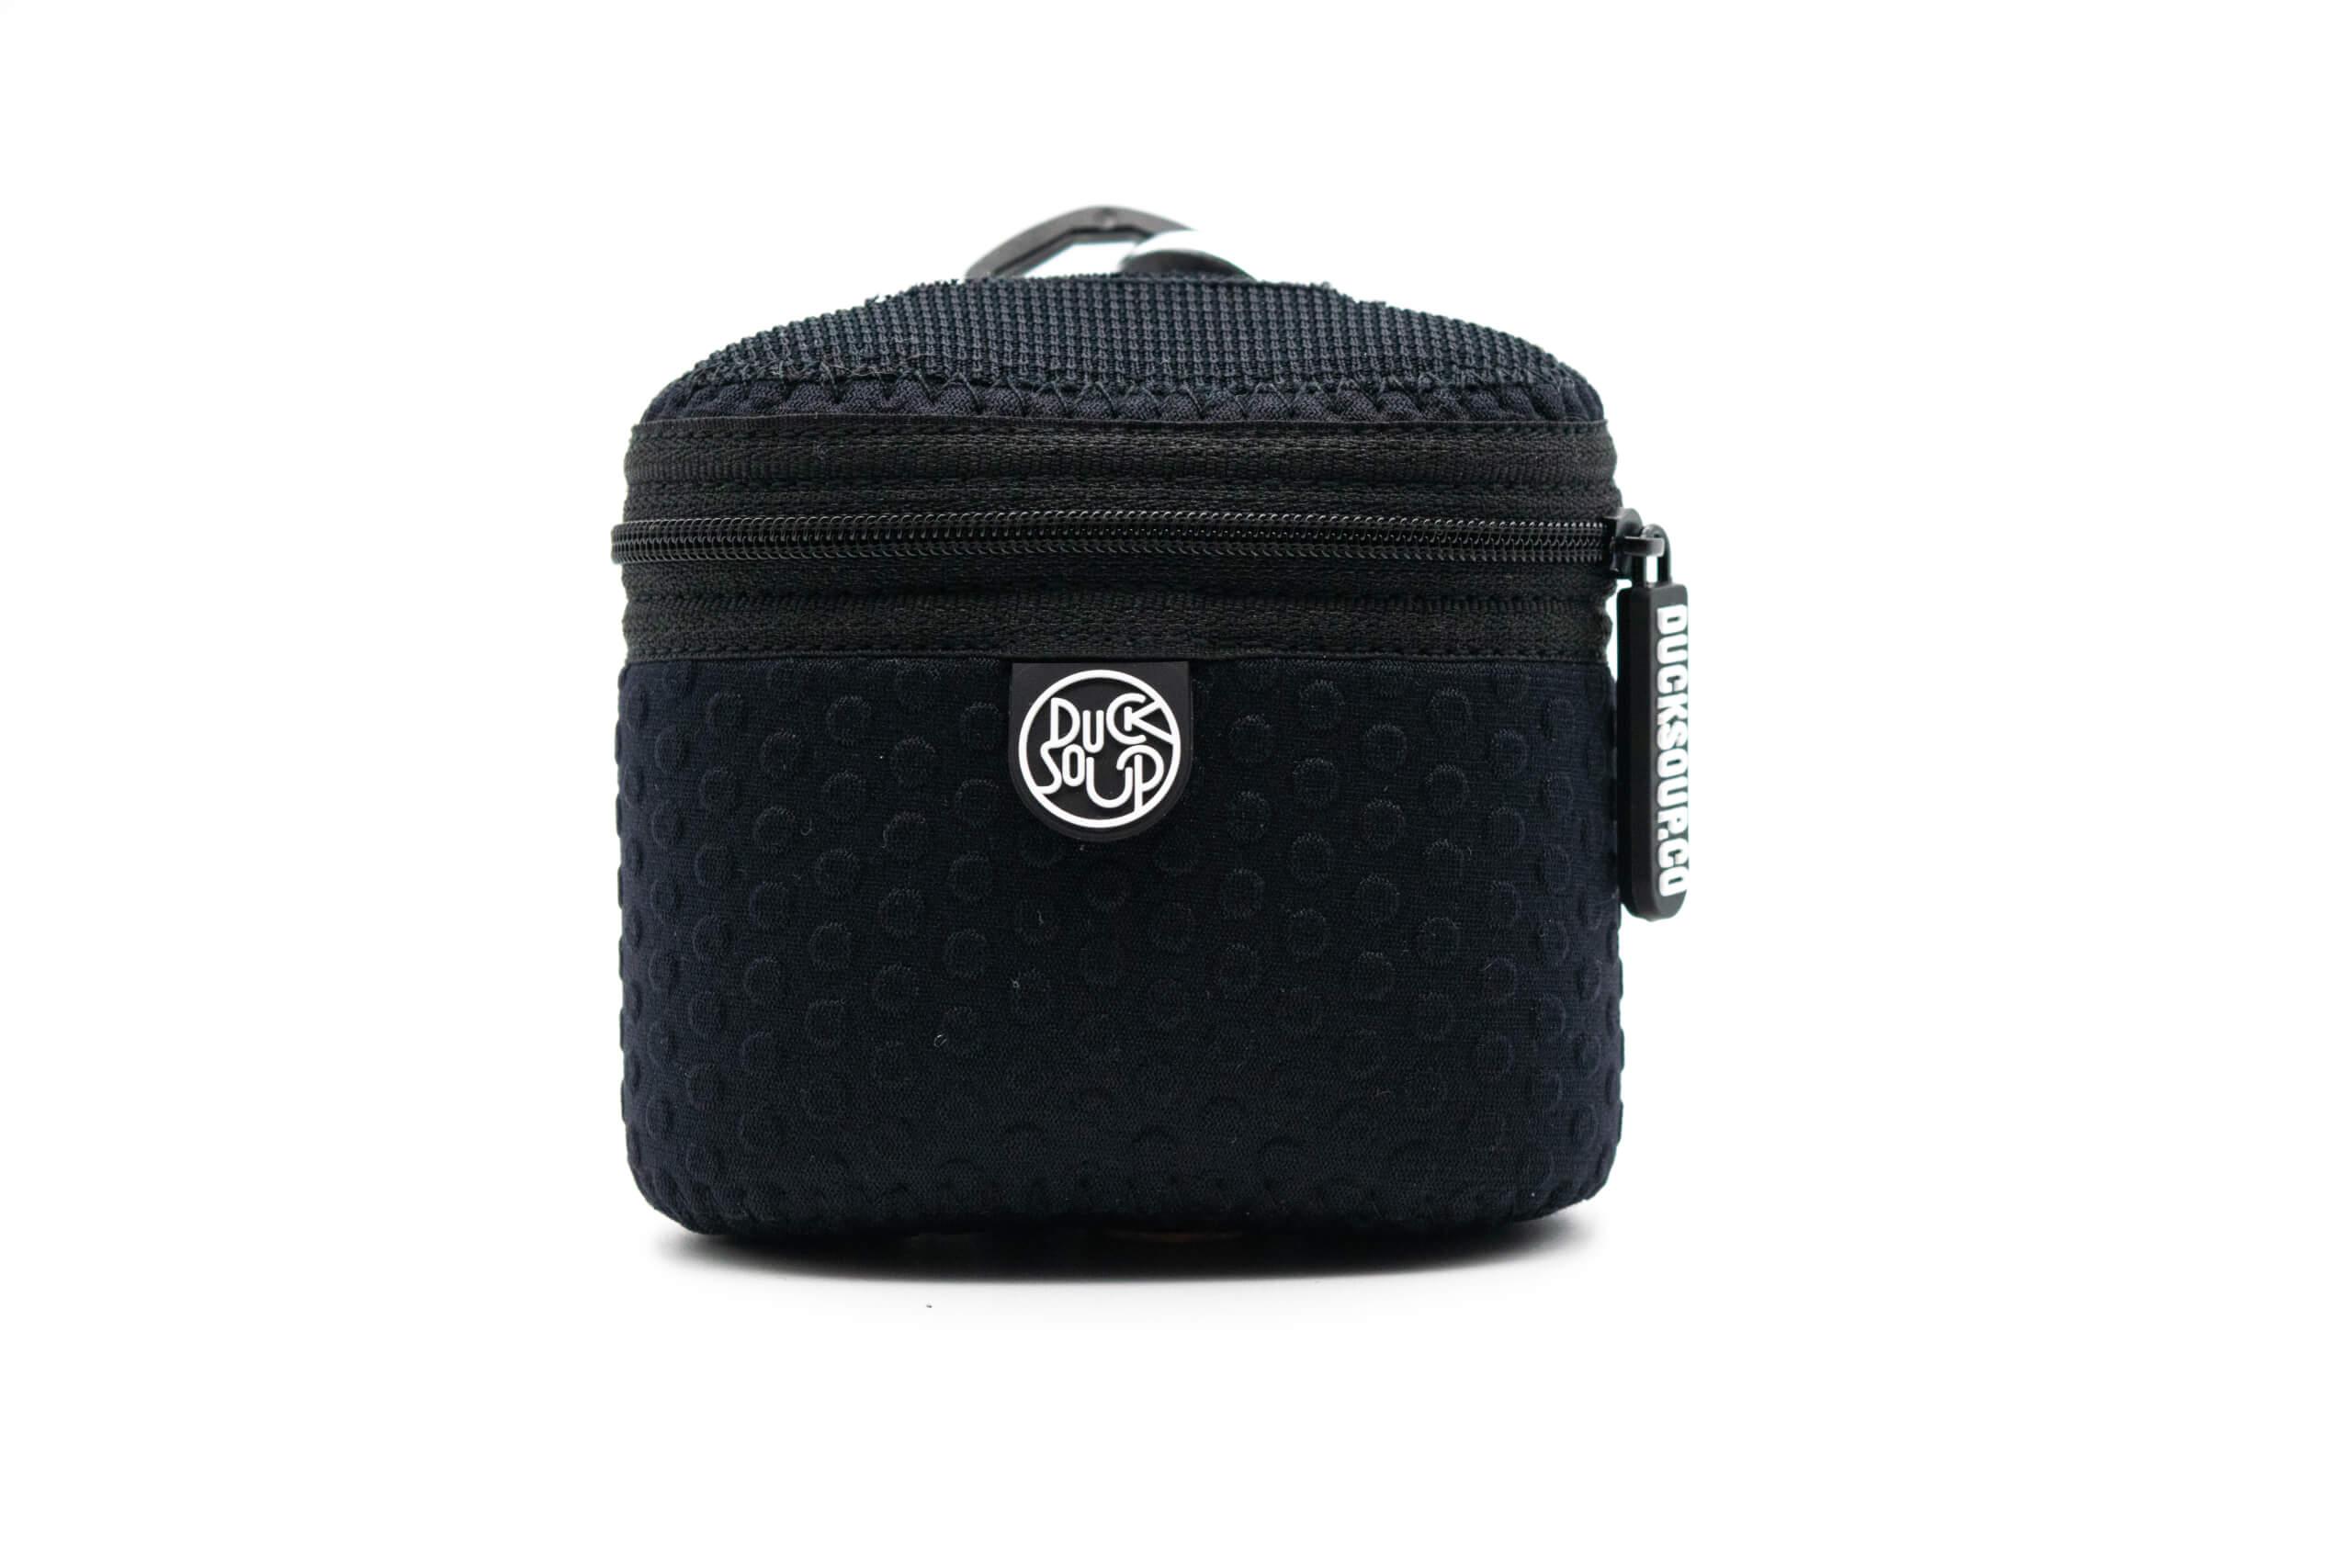 Black Dot Treat Bag Front View